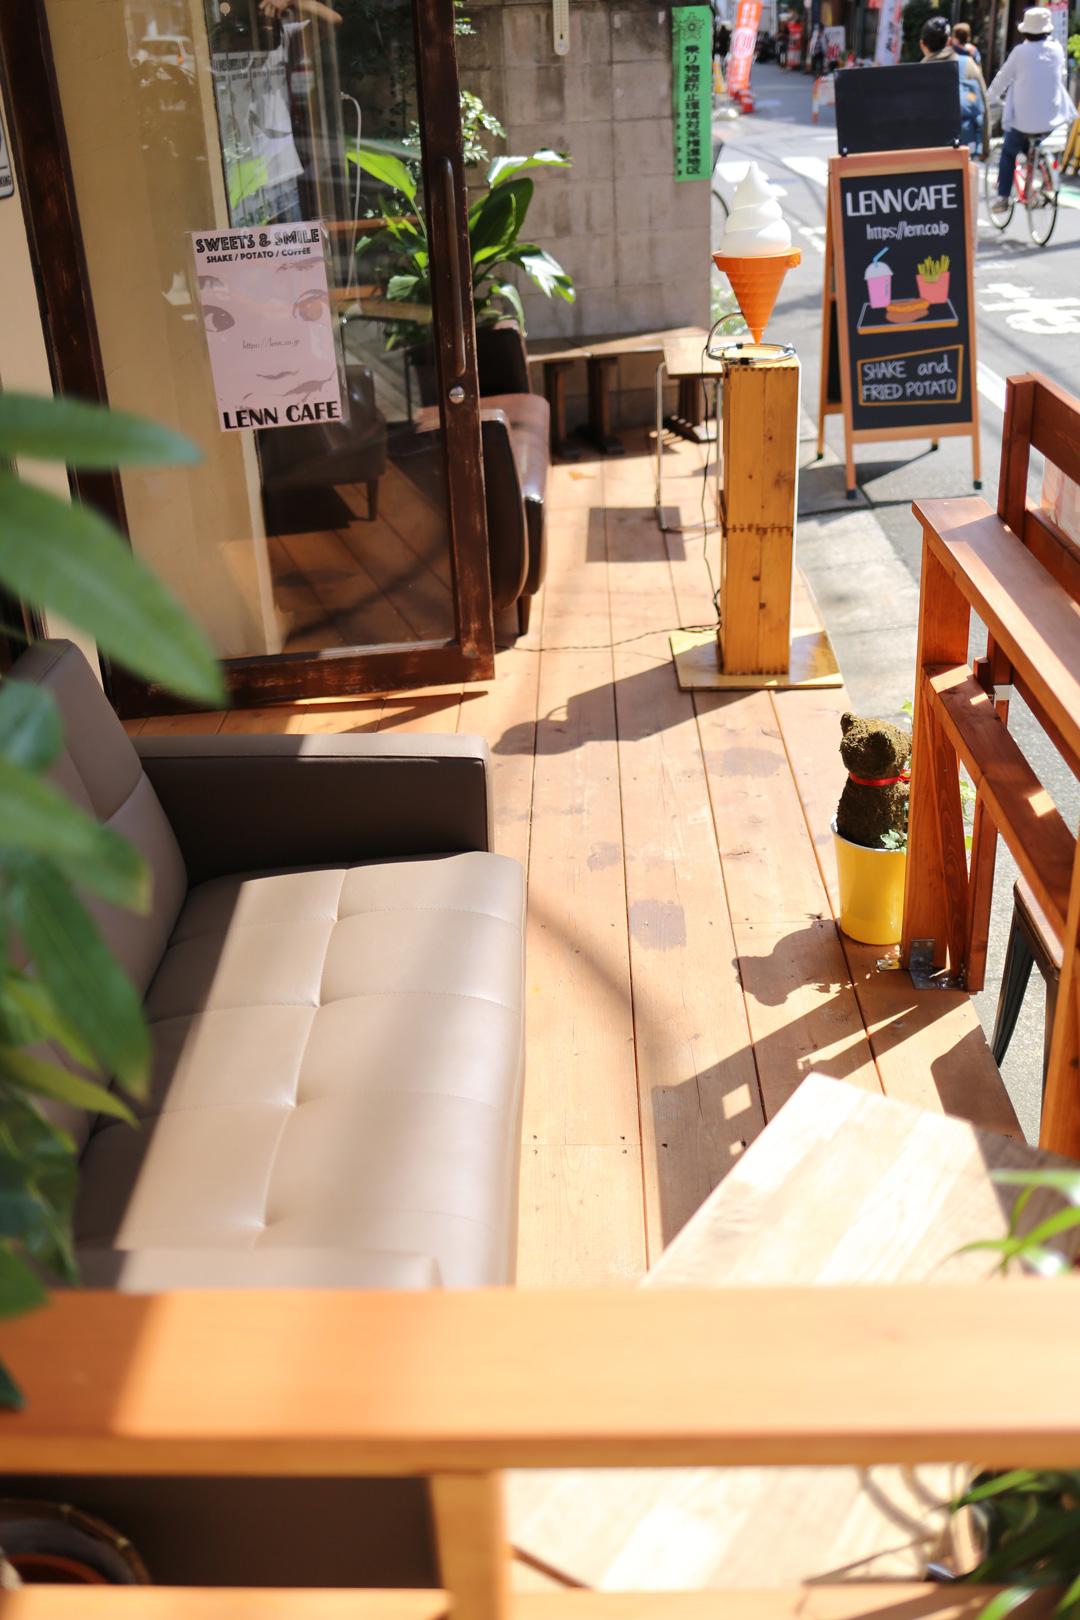 Terrace(テラス)レンカフェ(LENN-CAFE)8